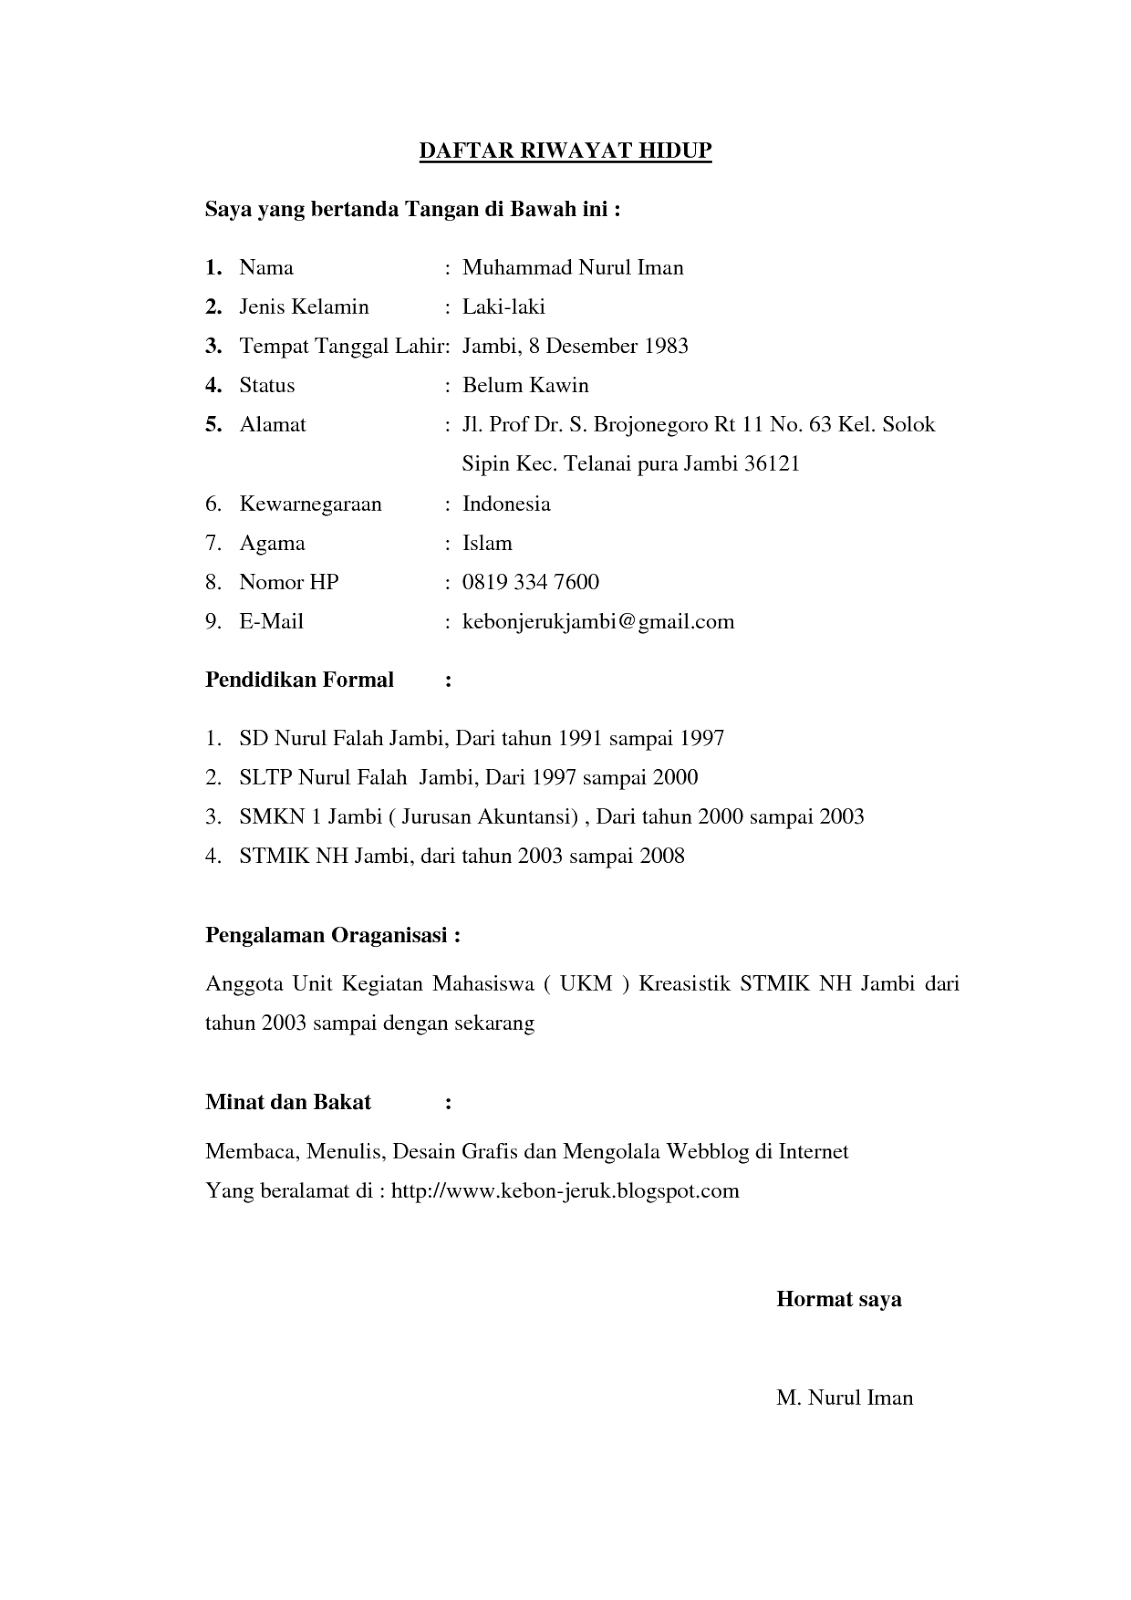 Contoh Daftar Riwayat Hidup Sederhana Cv Nabila